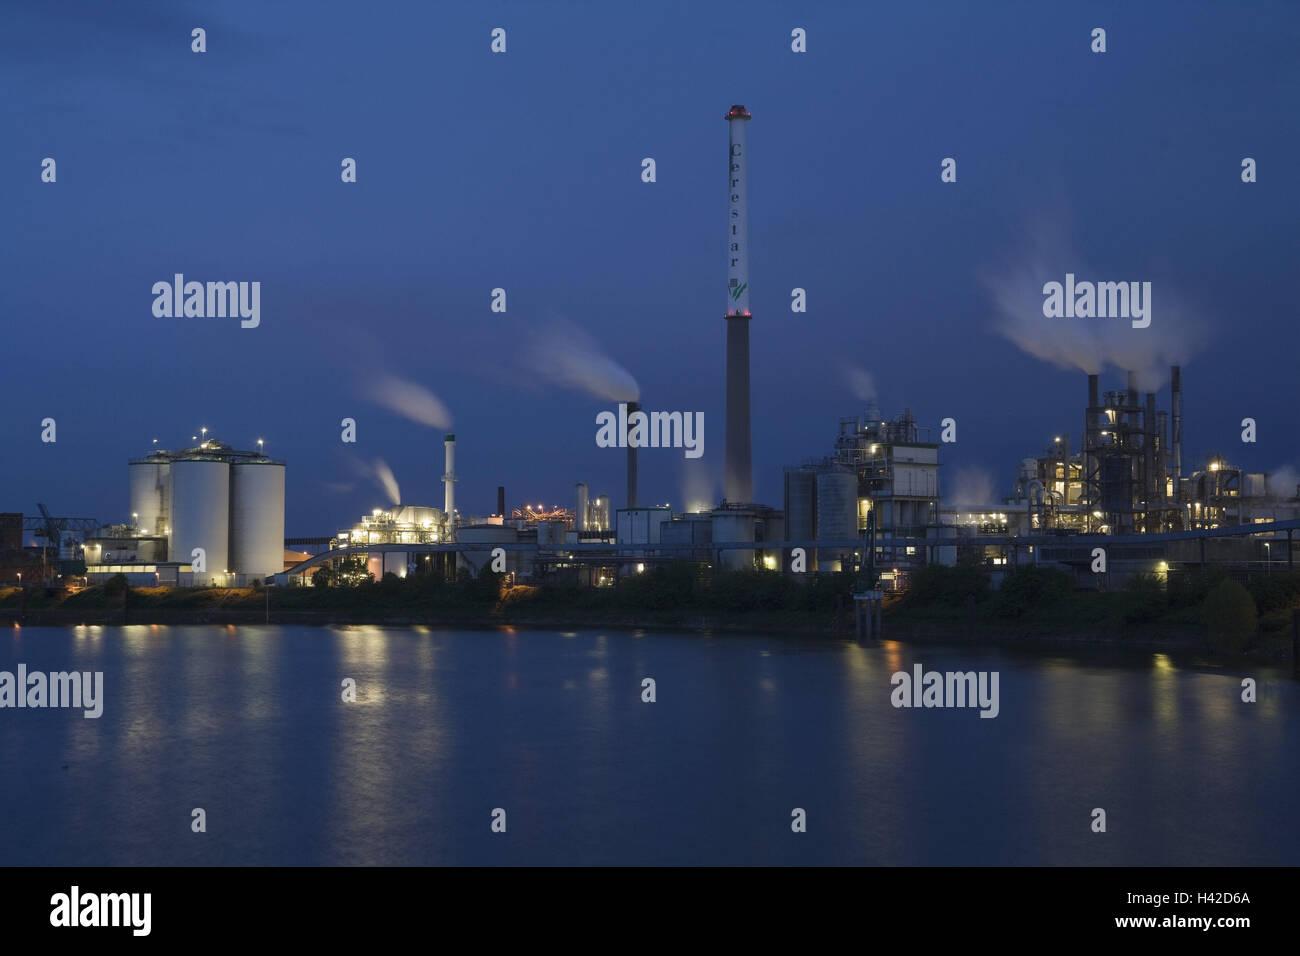 Germany, North Rhine-Westphalia, Krefeld, Uerdingen, Rhine harbour, industrial plant, refinery, night, river, the Stock Photo